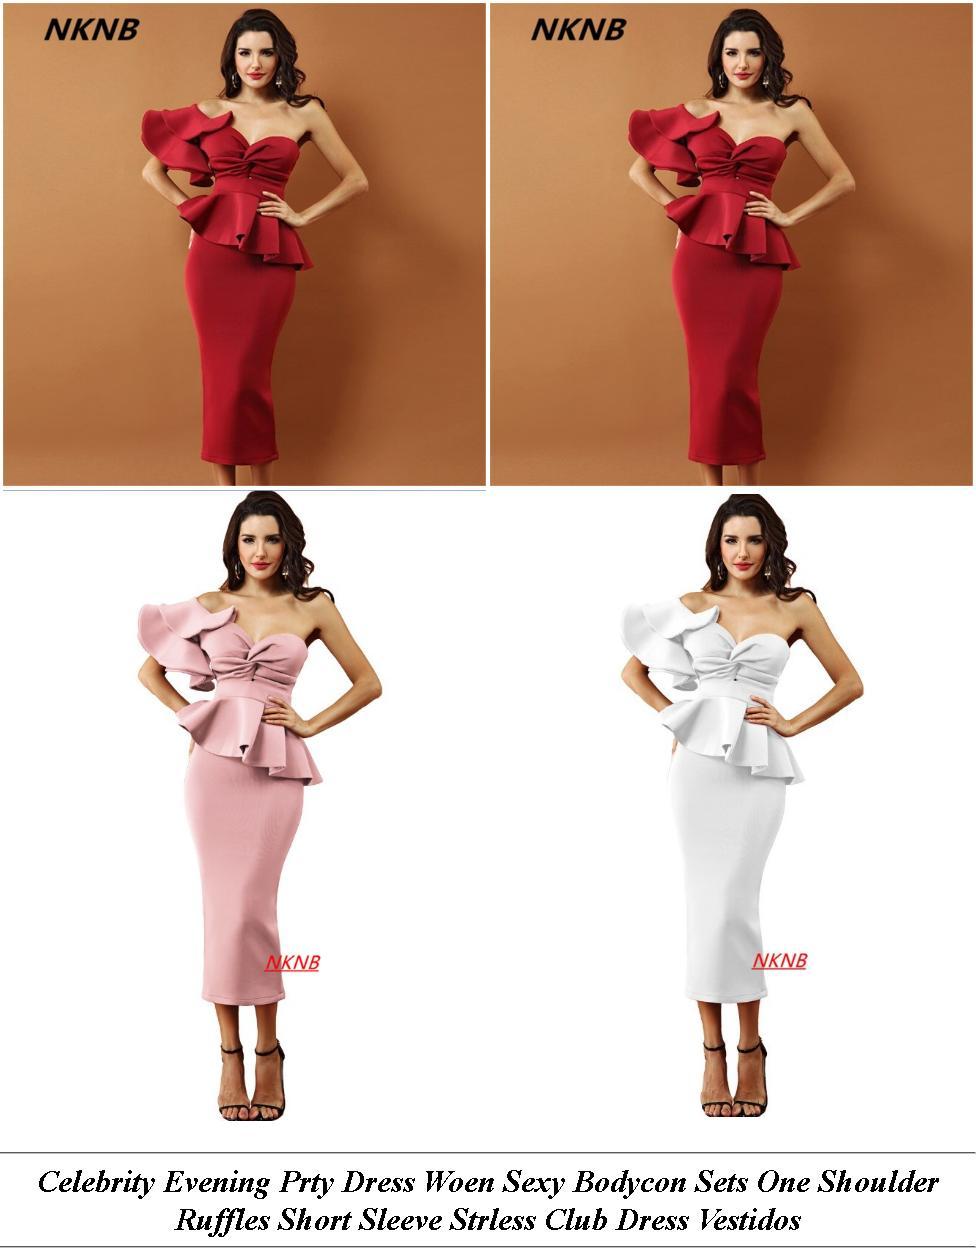 Glamorous Party Dresses Uk - Where To Find Vintage Clothing Near Me - Cheap Ladies Dresses Australia